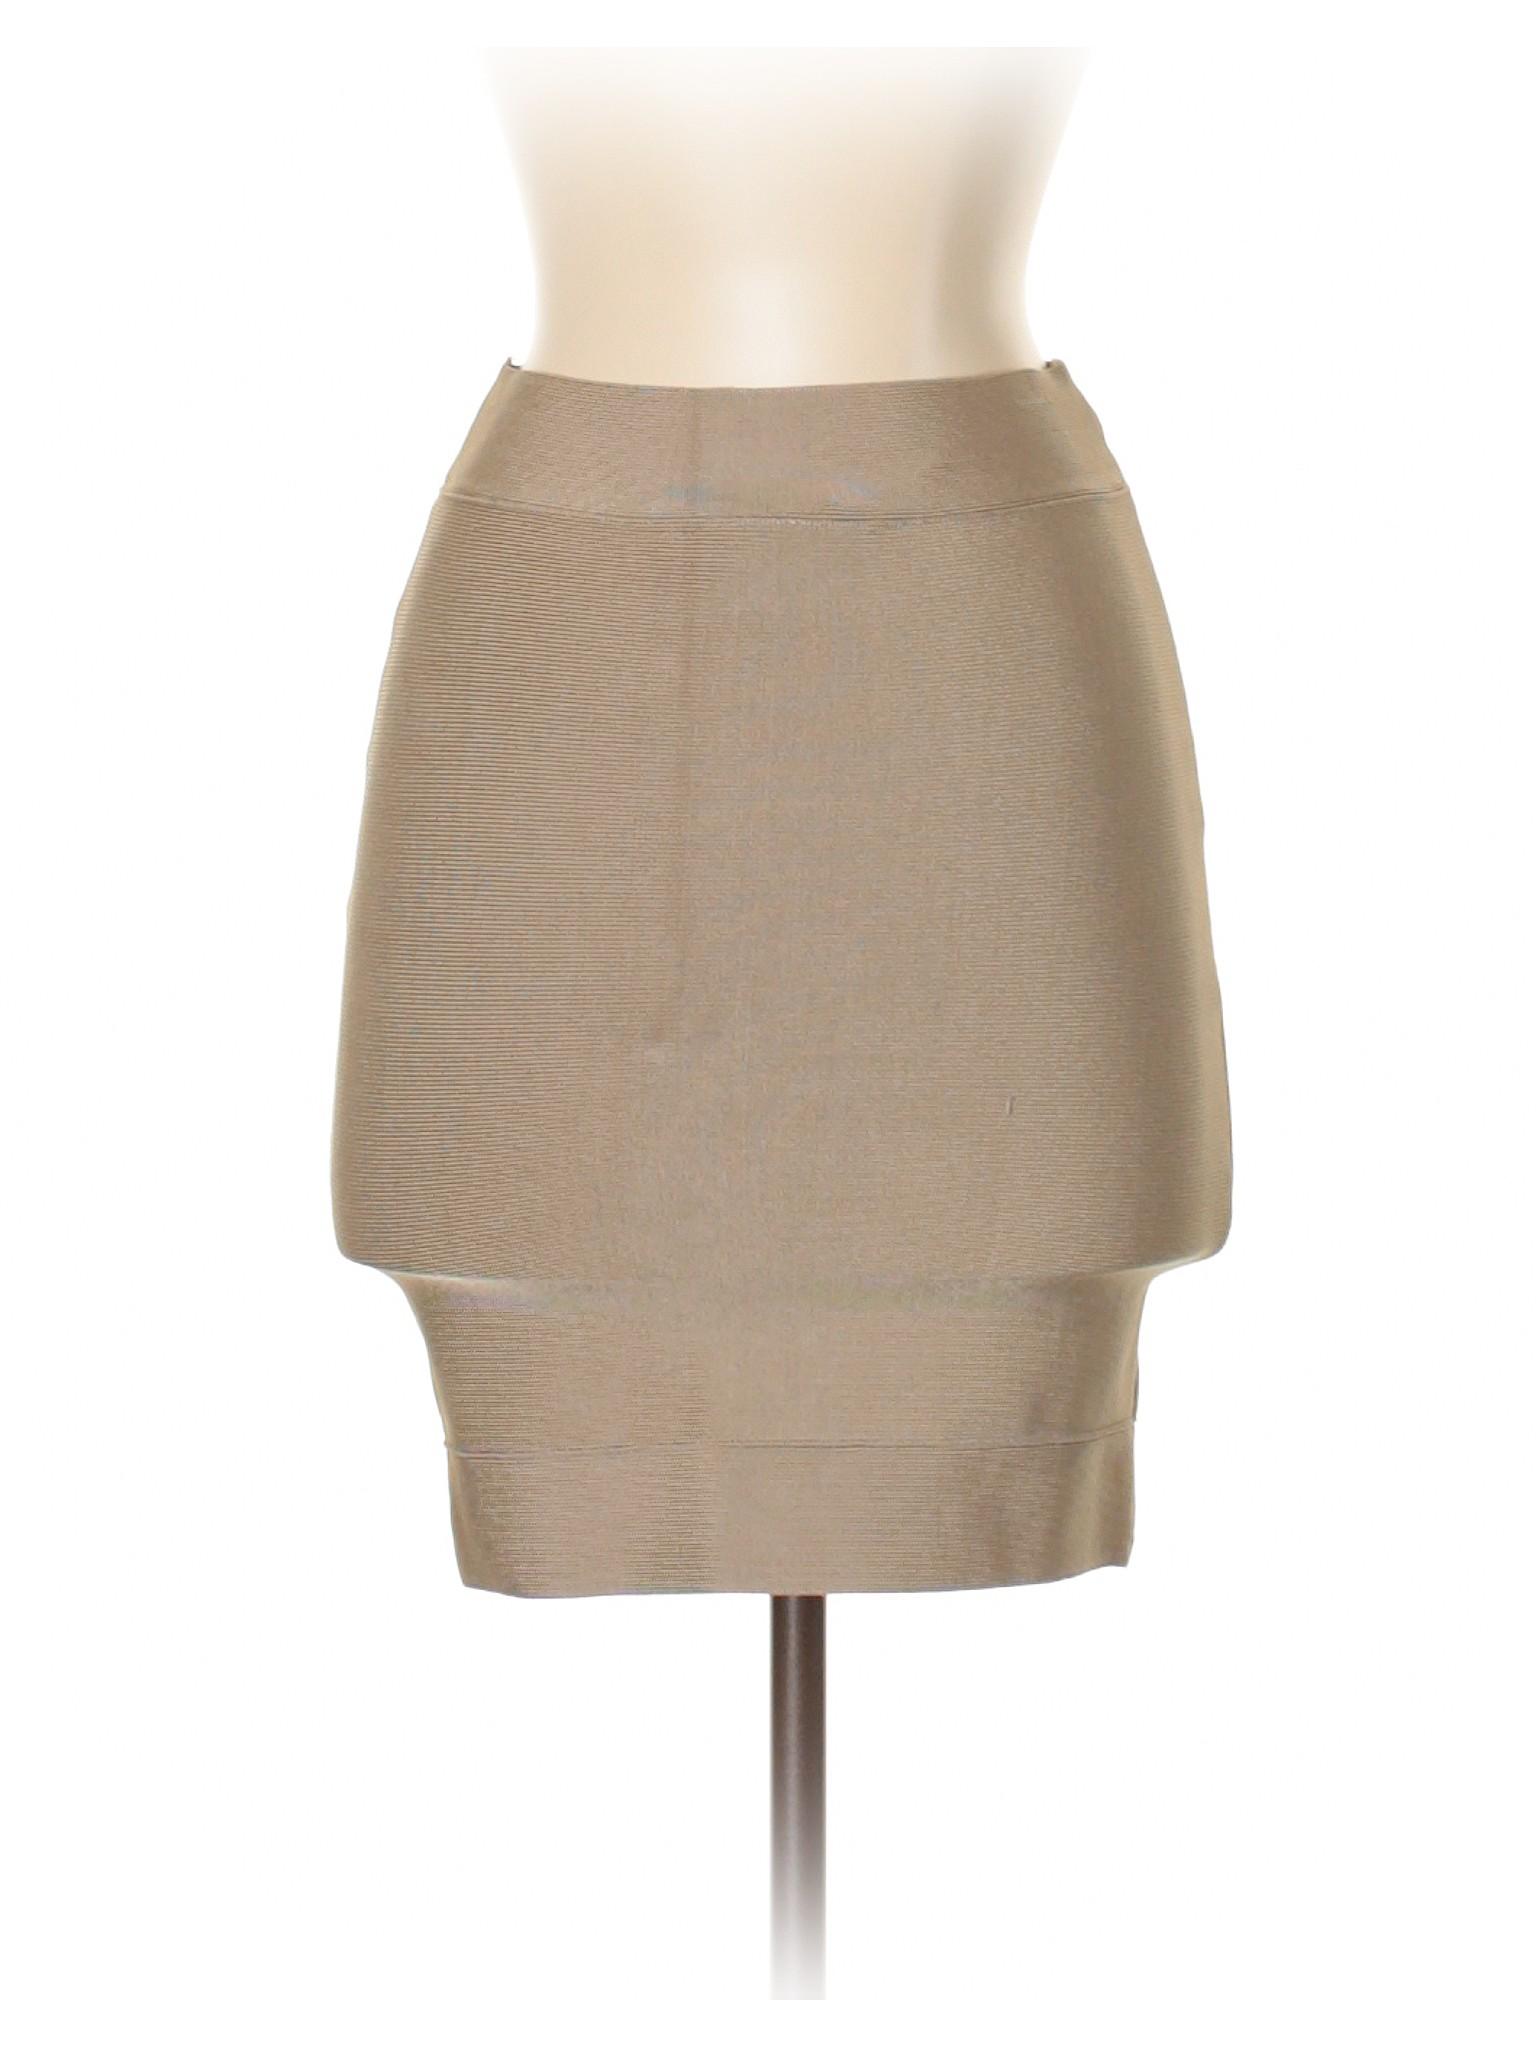 Casual Casual Skirt Skirt Boutique Skirt Boutique Boutique Casual Skirt Skirt Casual Boutique Casual Boutique Casual Boutique CwC0nxr